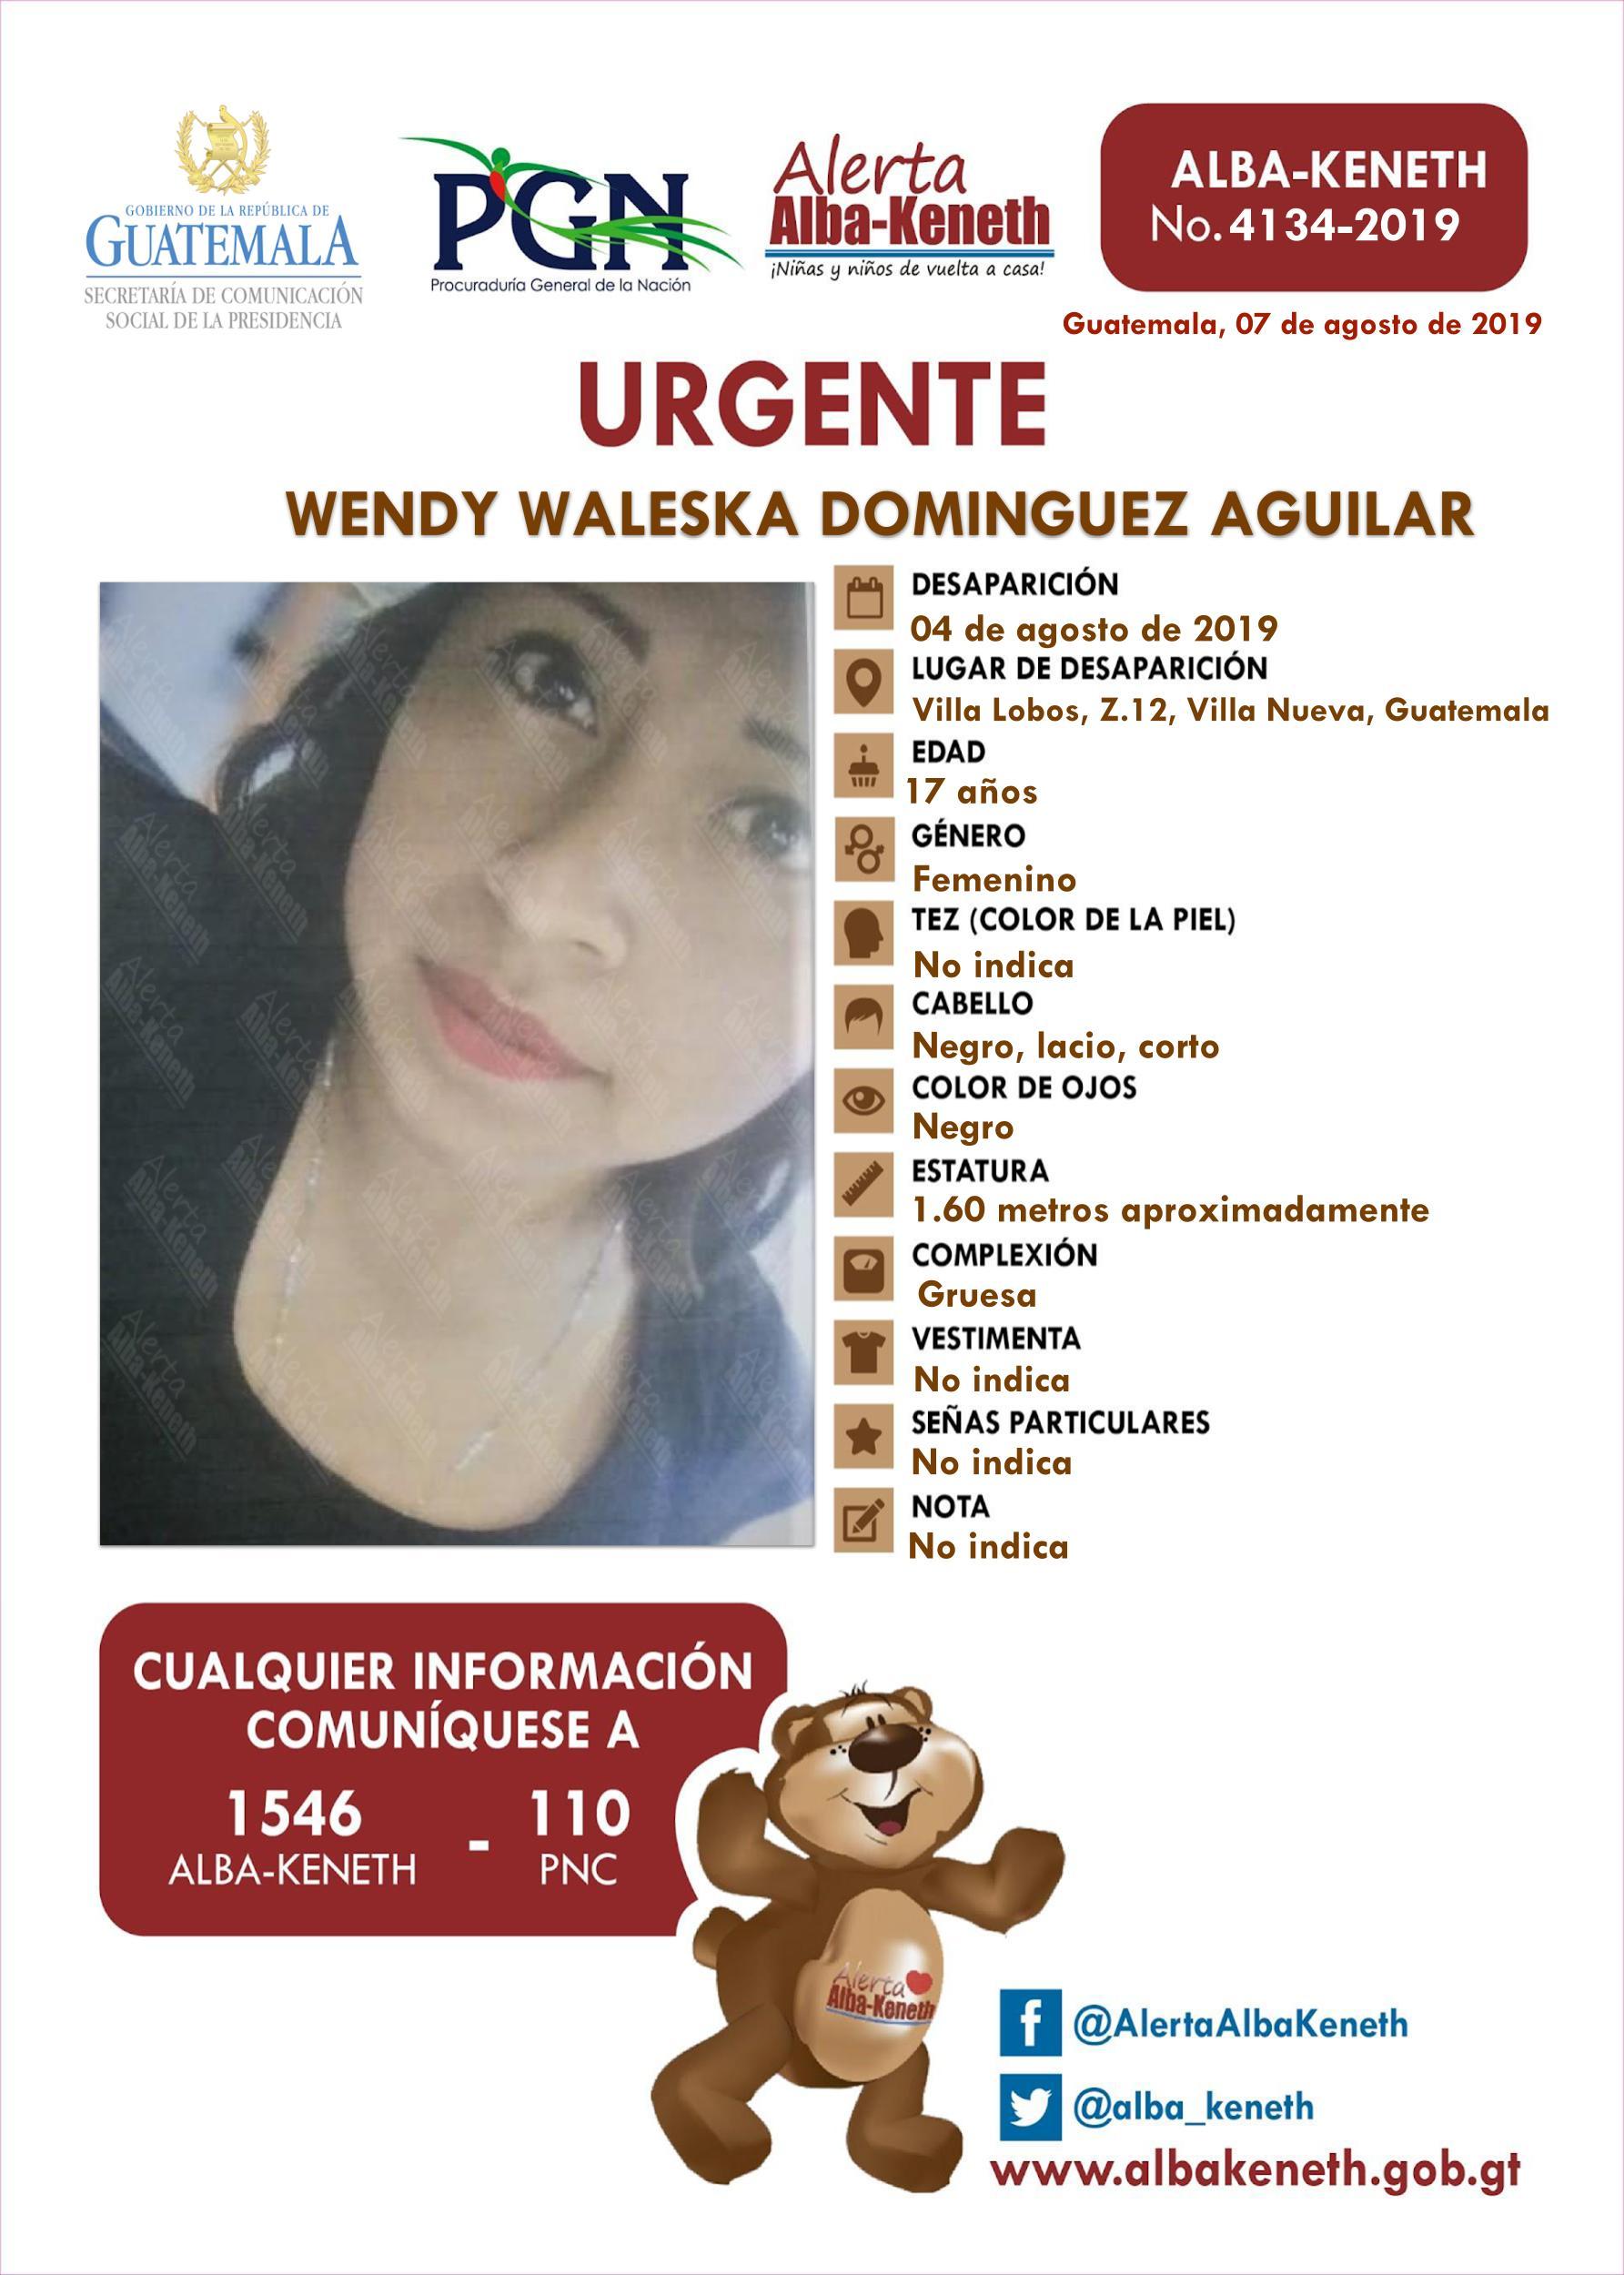 Wendy Waleska Dominguez Aguilar